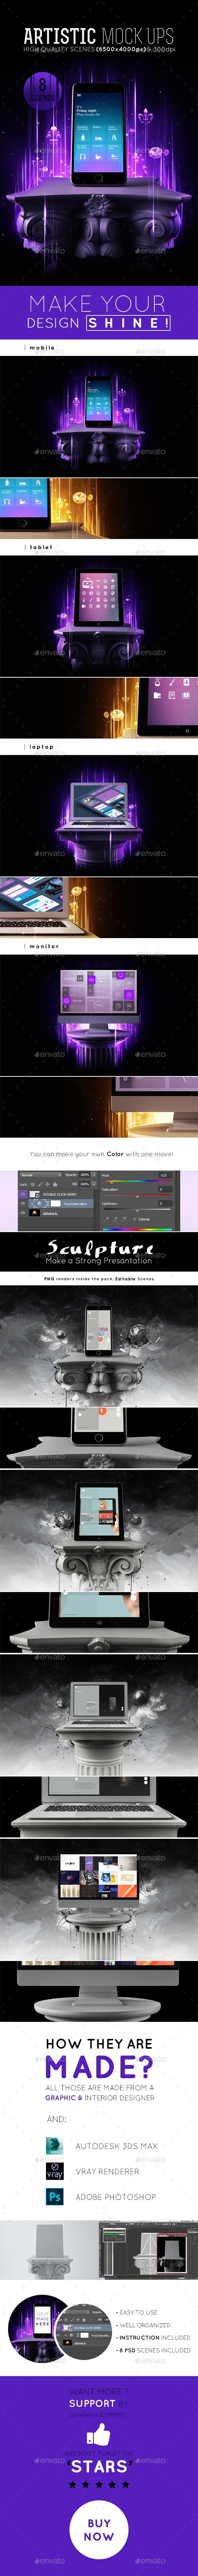 GraphicRiver 8 Artistic Mockups 11144186